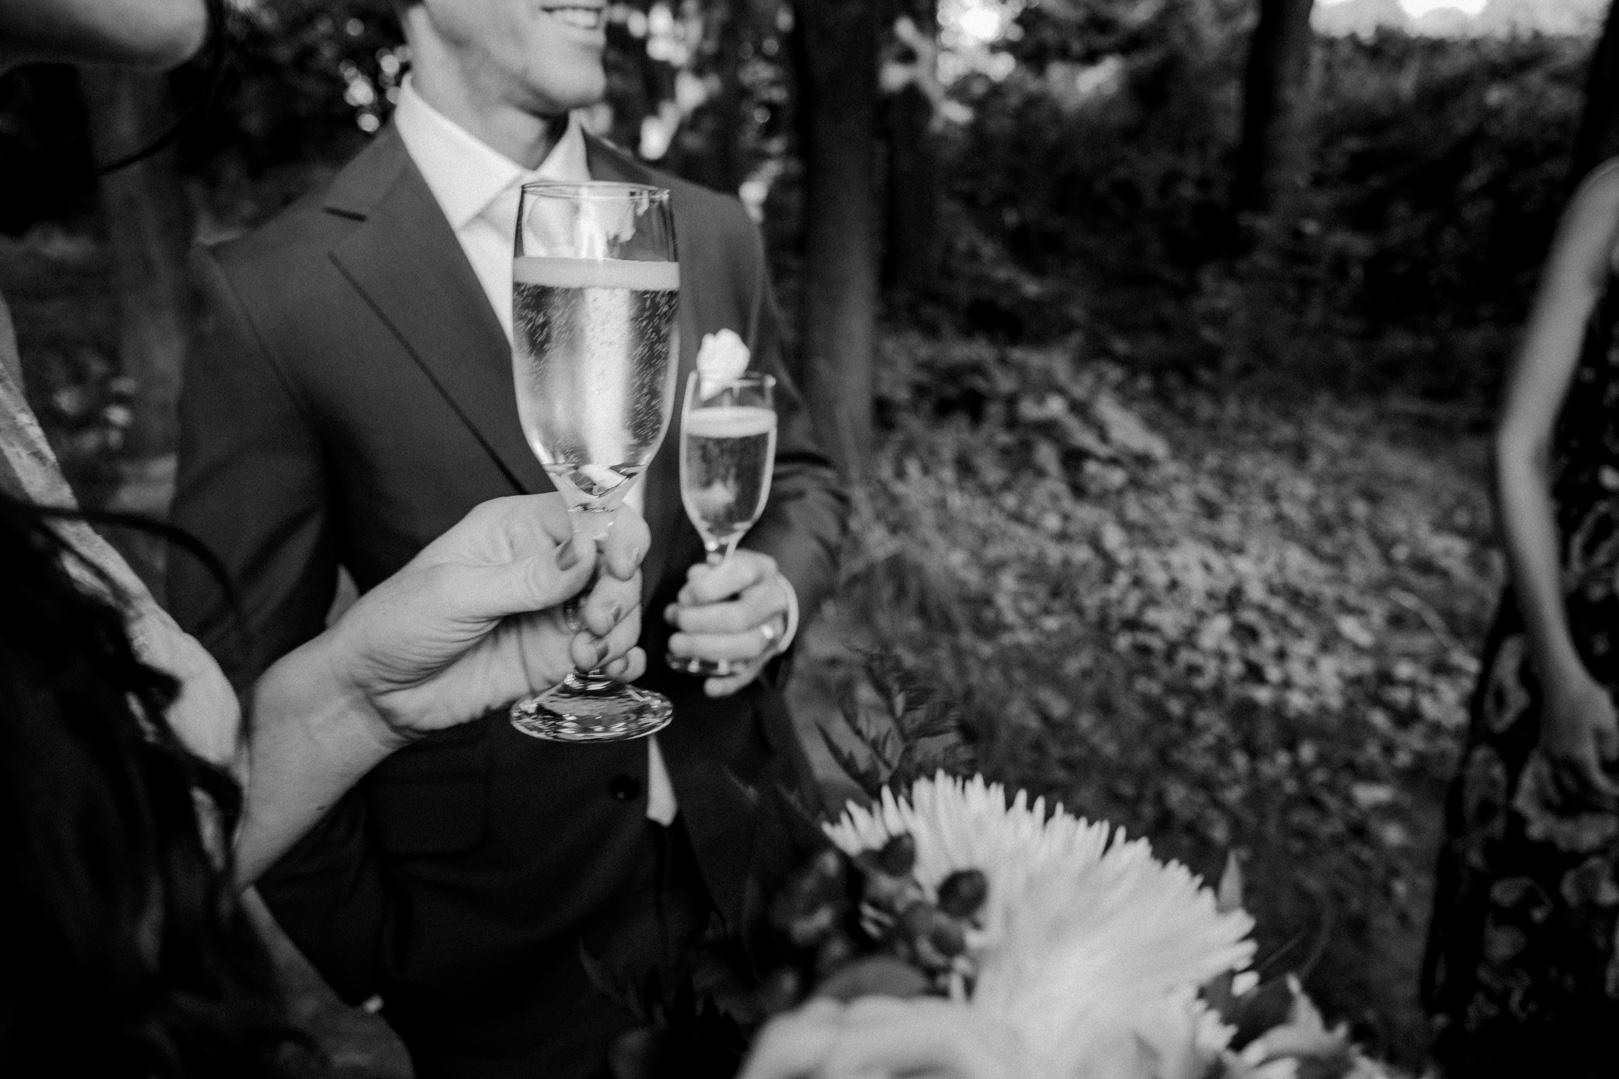 57_JACQUELINE RICHARD WEDDING-795_Events_Weddings_2018_Travel_Engagement_Photography_best_Portraits.jpg